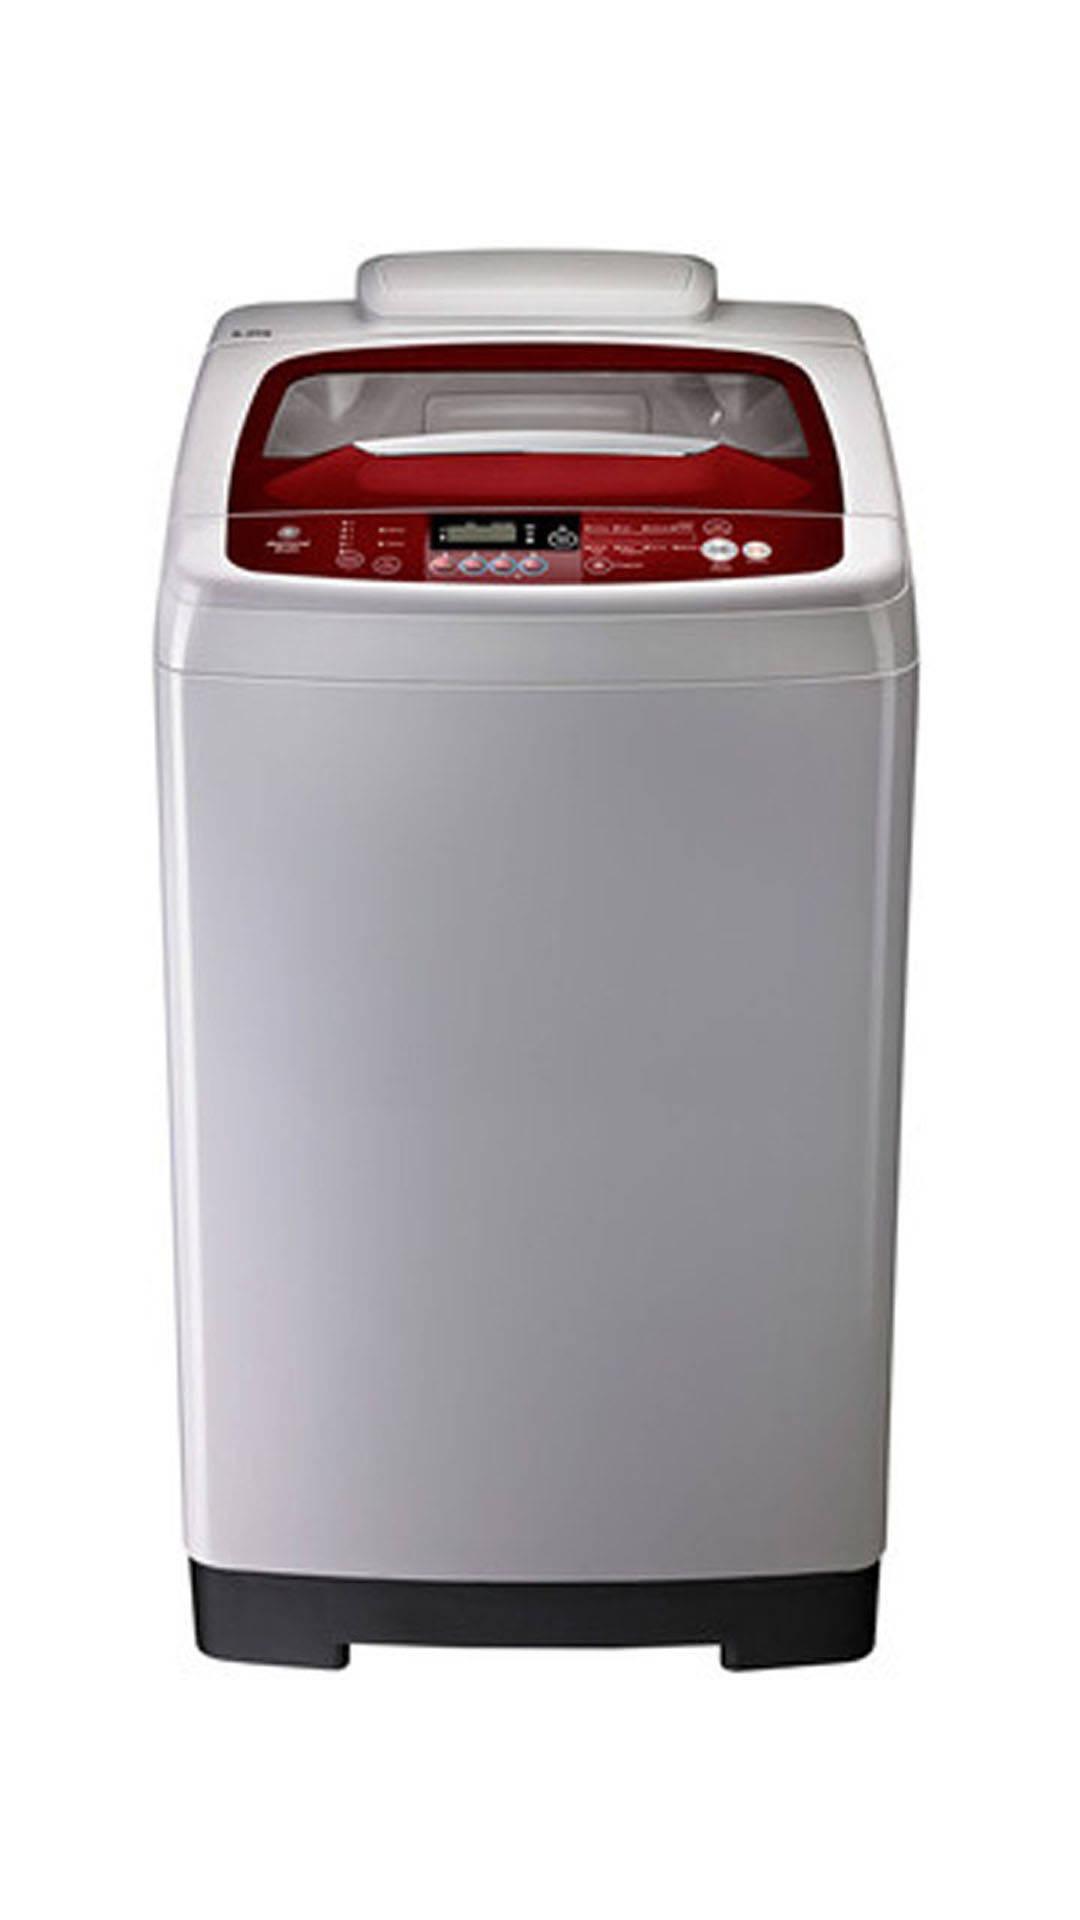 samsung washing machine customer service